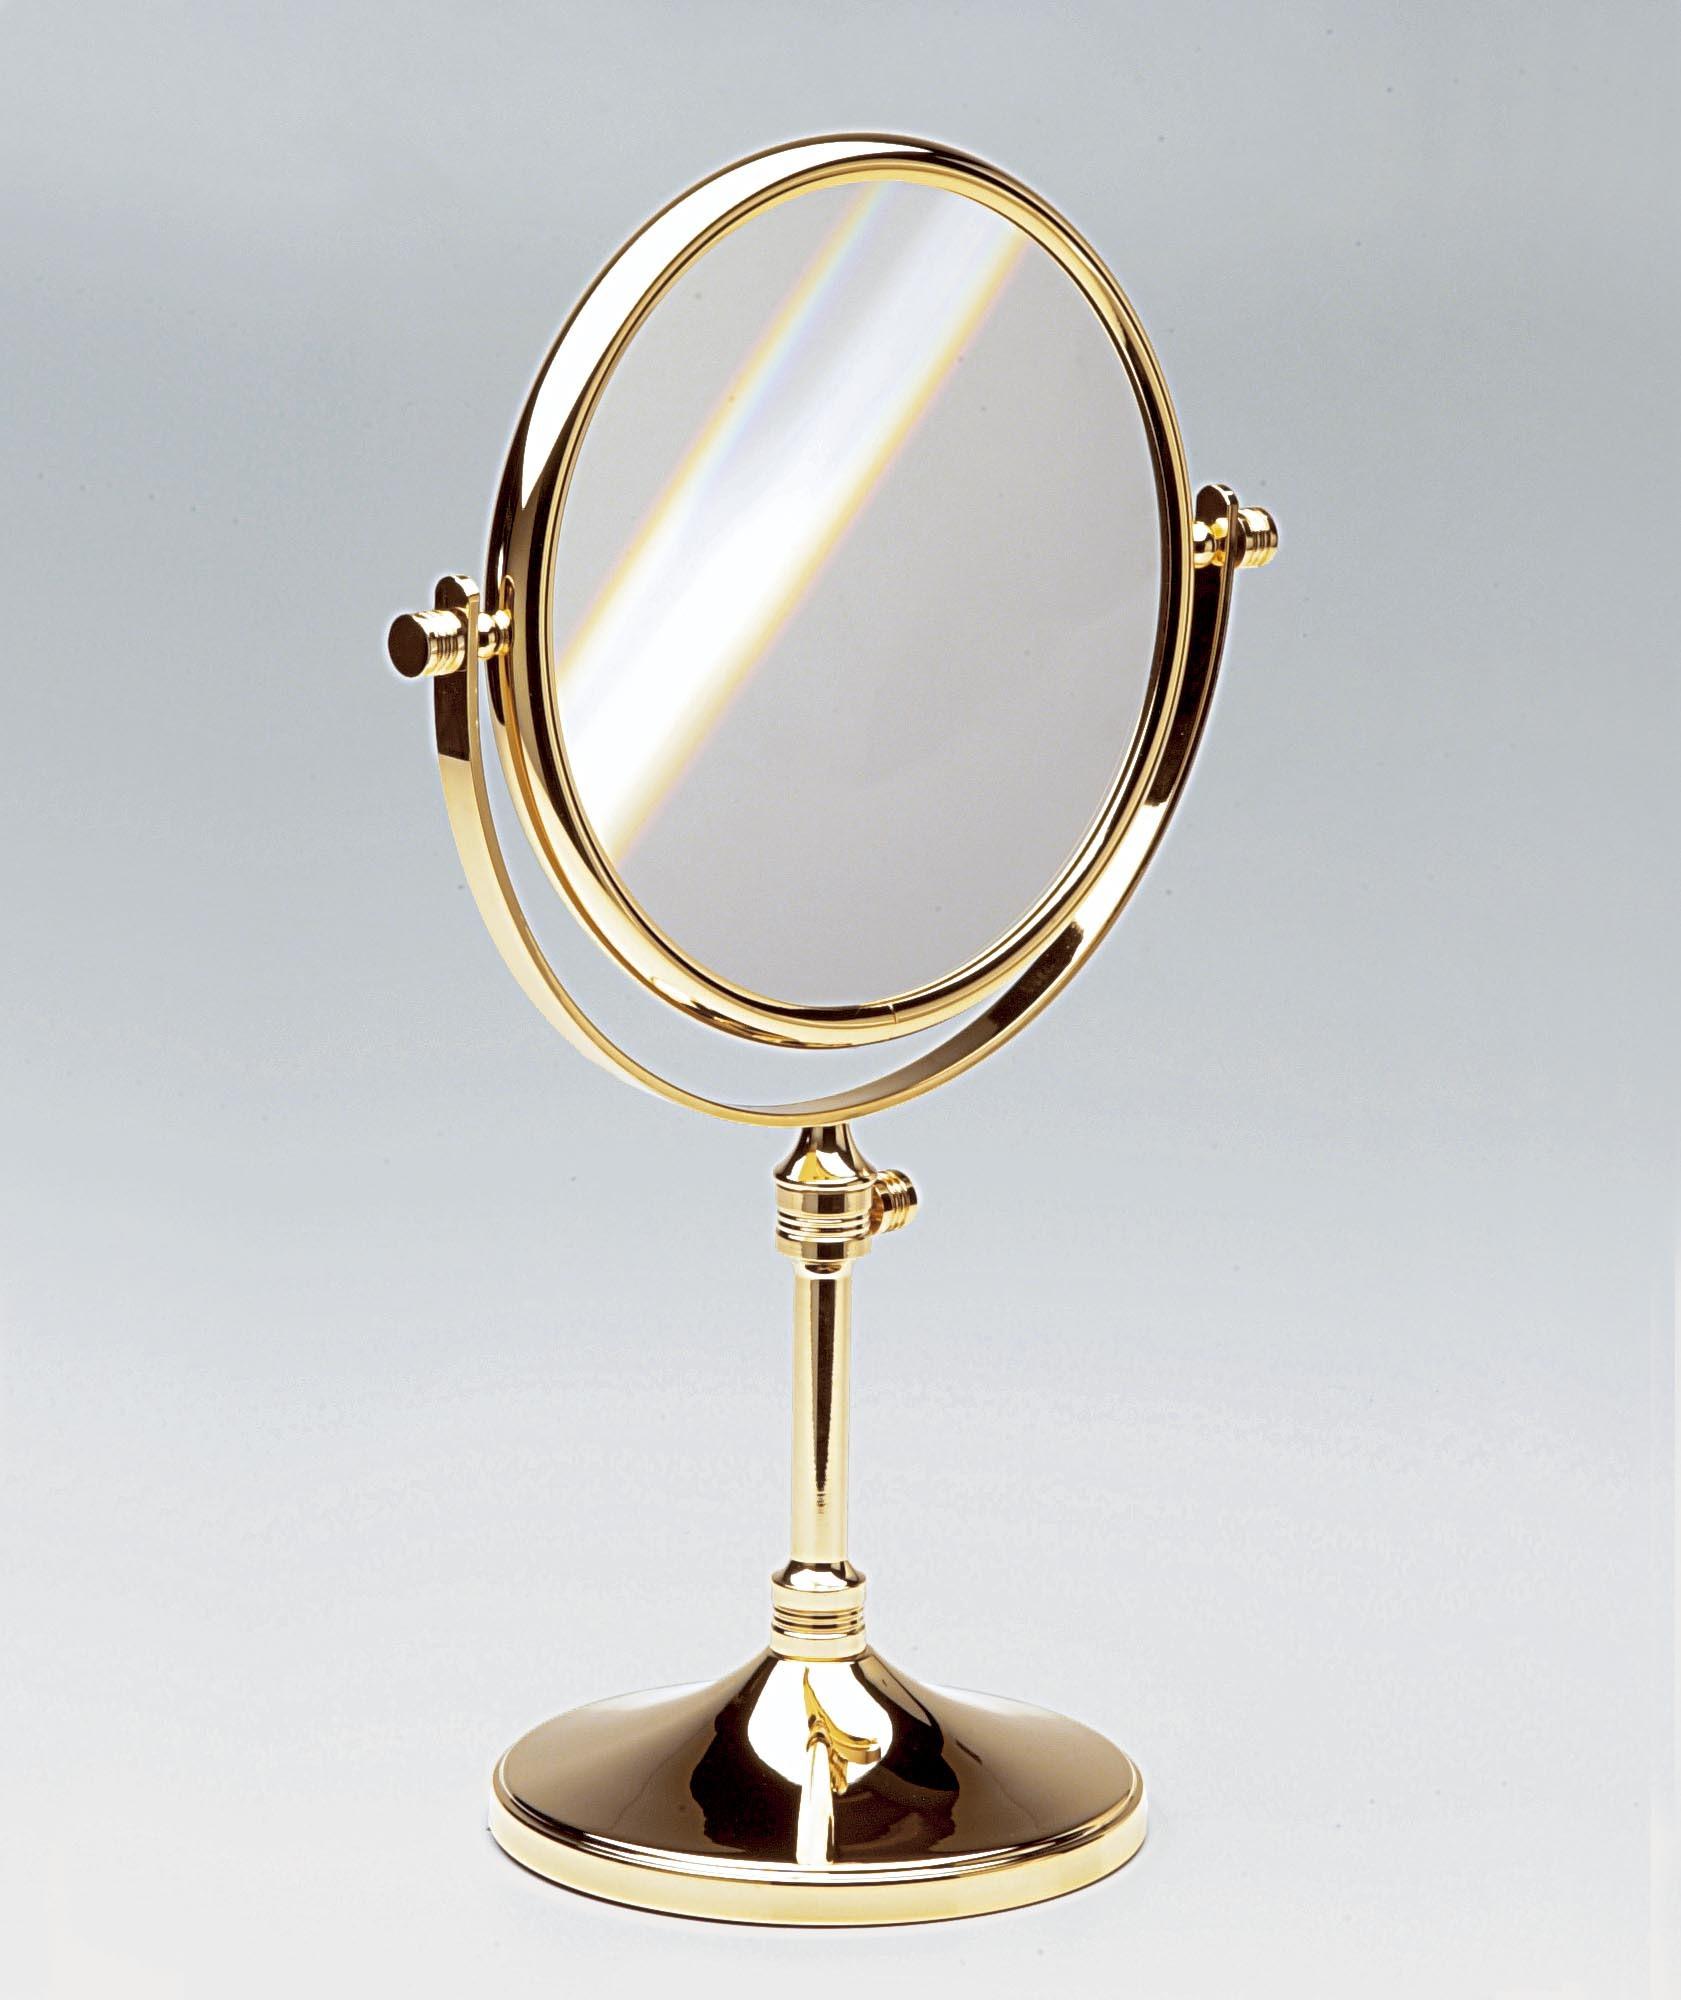 Зеркала Зеркало косметическое Windisch 99132CRO 7XOP Ribbed elitnoe-zerkalo-kosmeticheskoe-99132-ribbed-ot-windisch-ispaniya.JPG